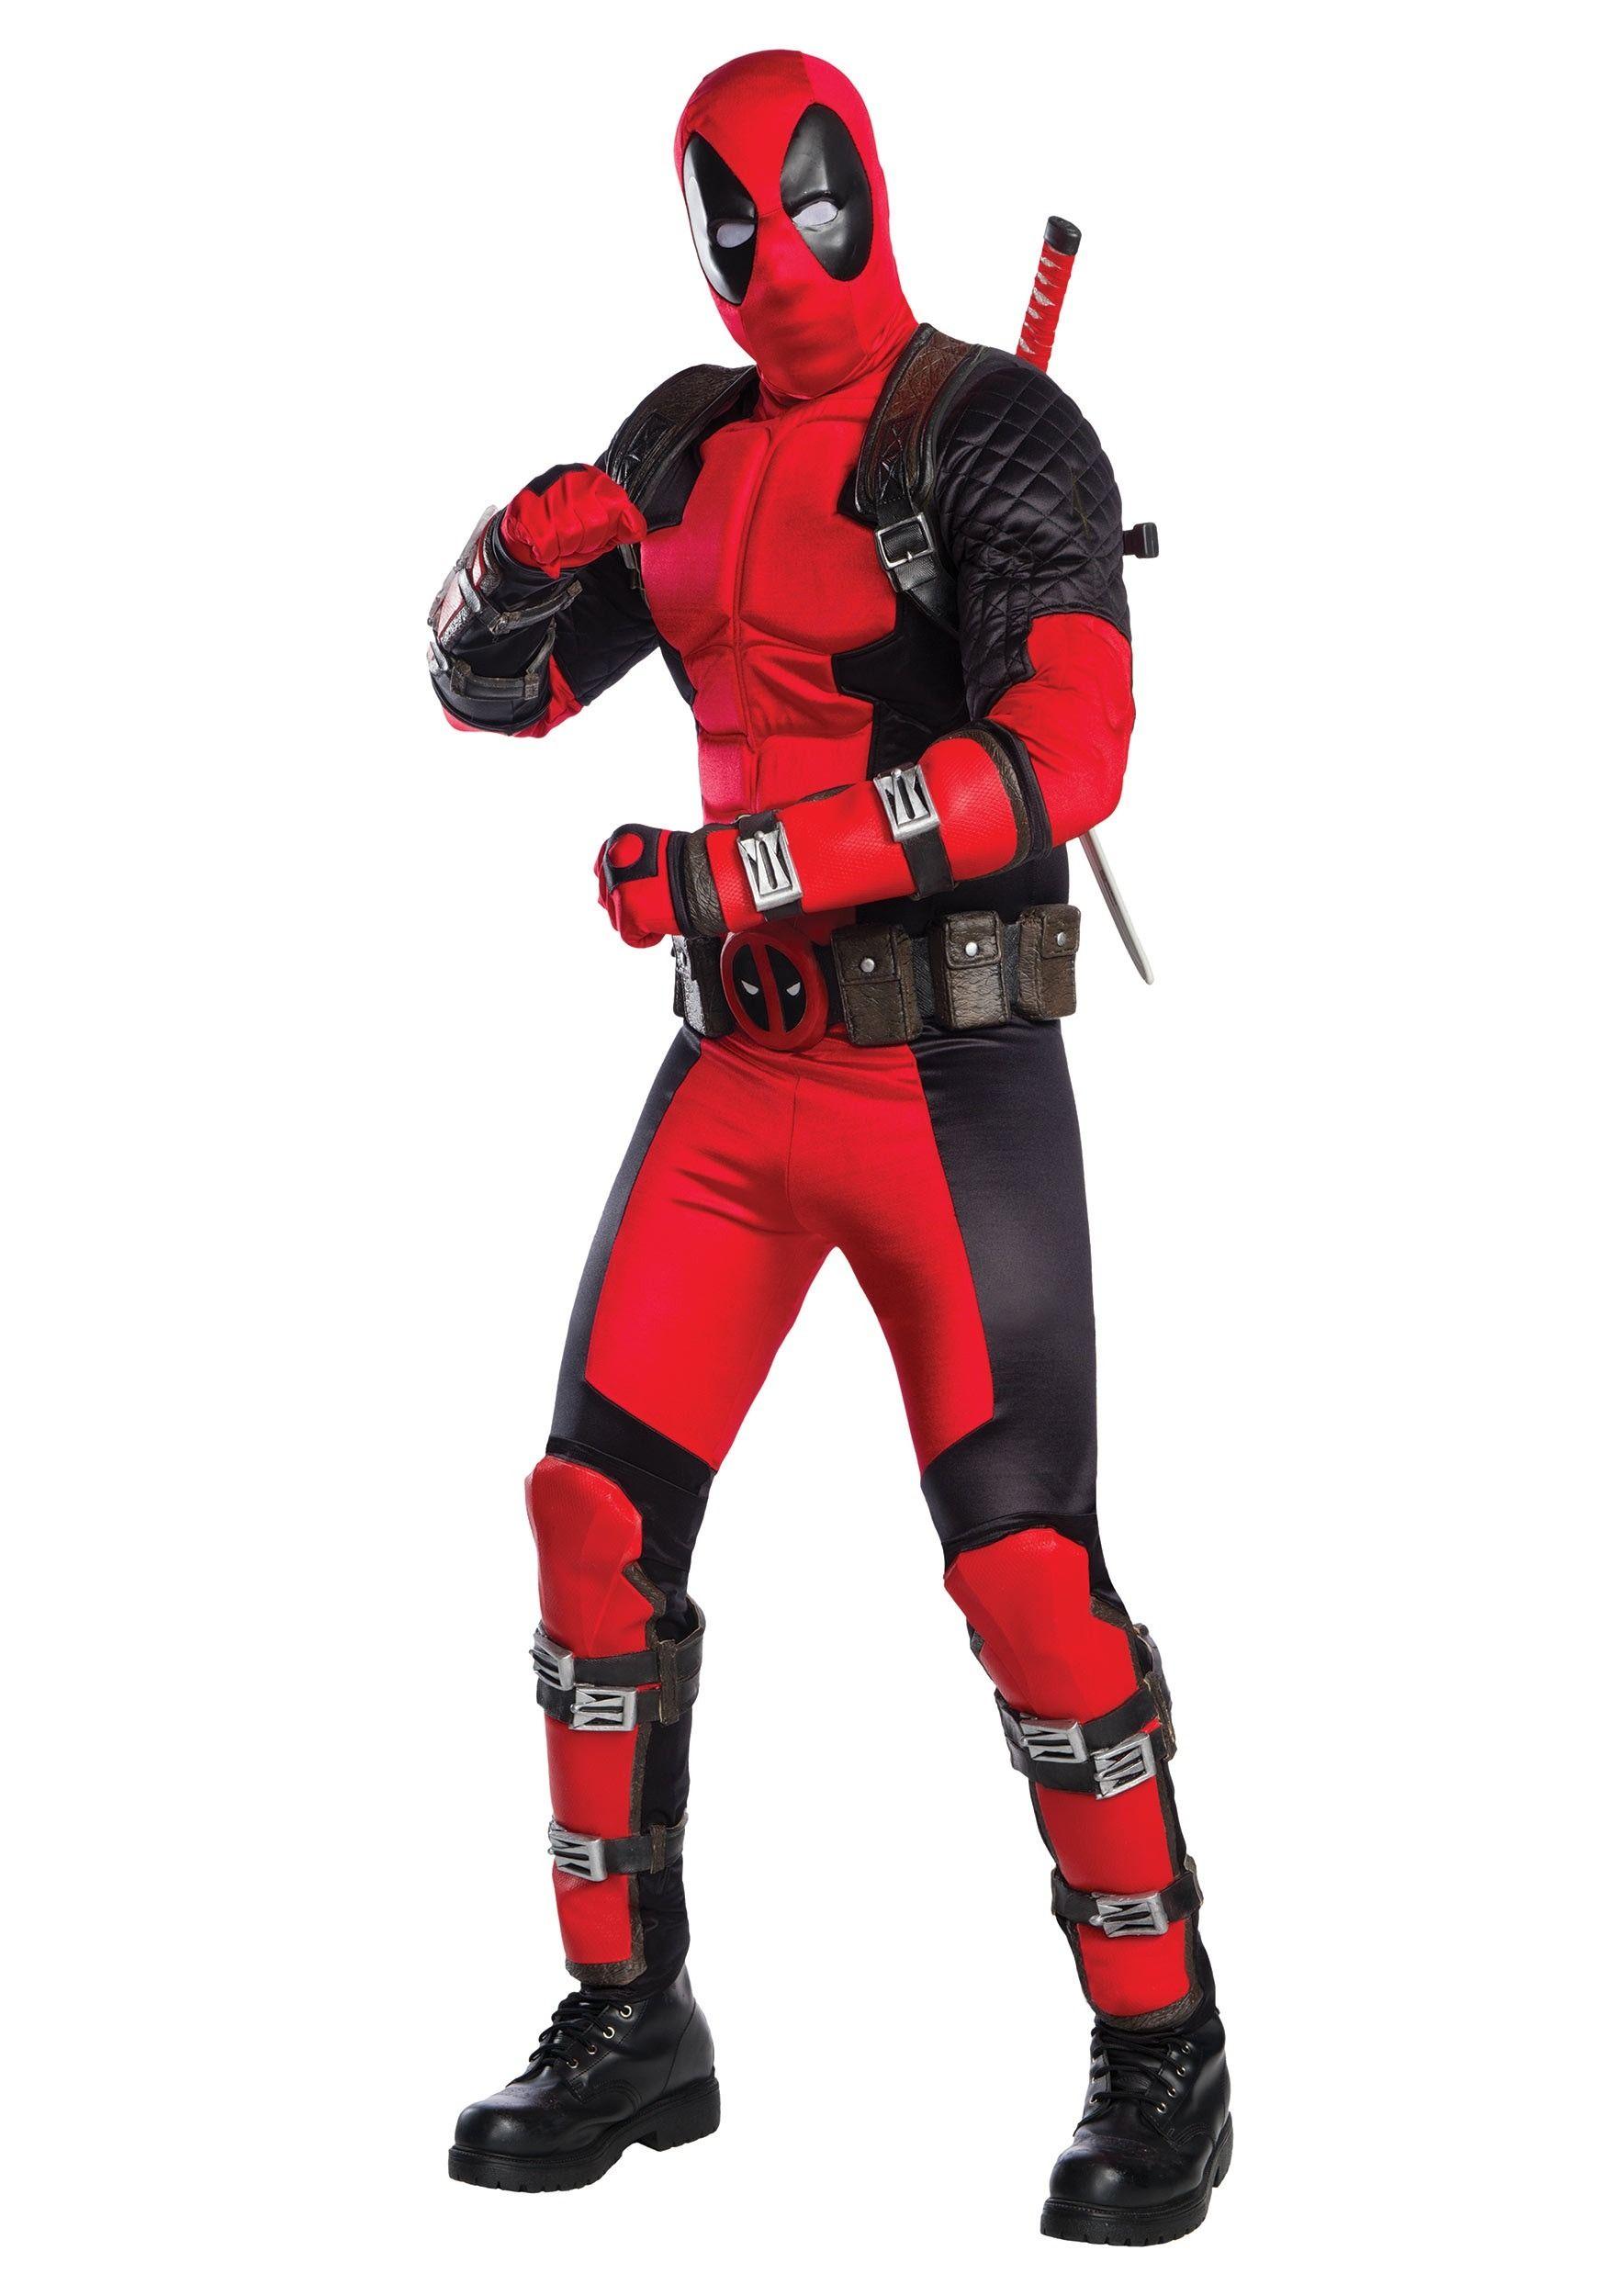 83fd1757b11 TV and Movie News GIVEAWAY: Win A Premium Superhero Halloween ...